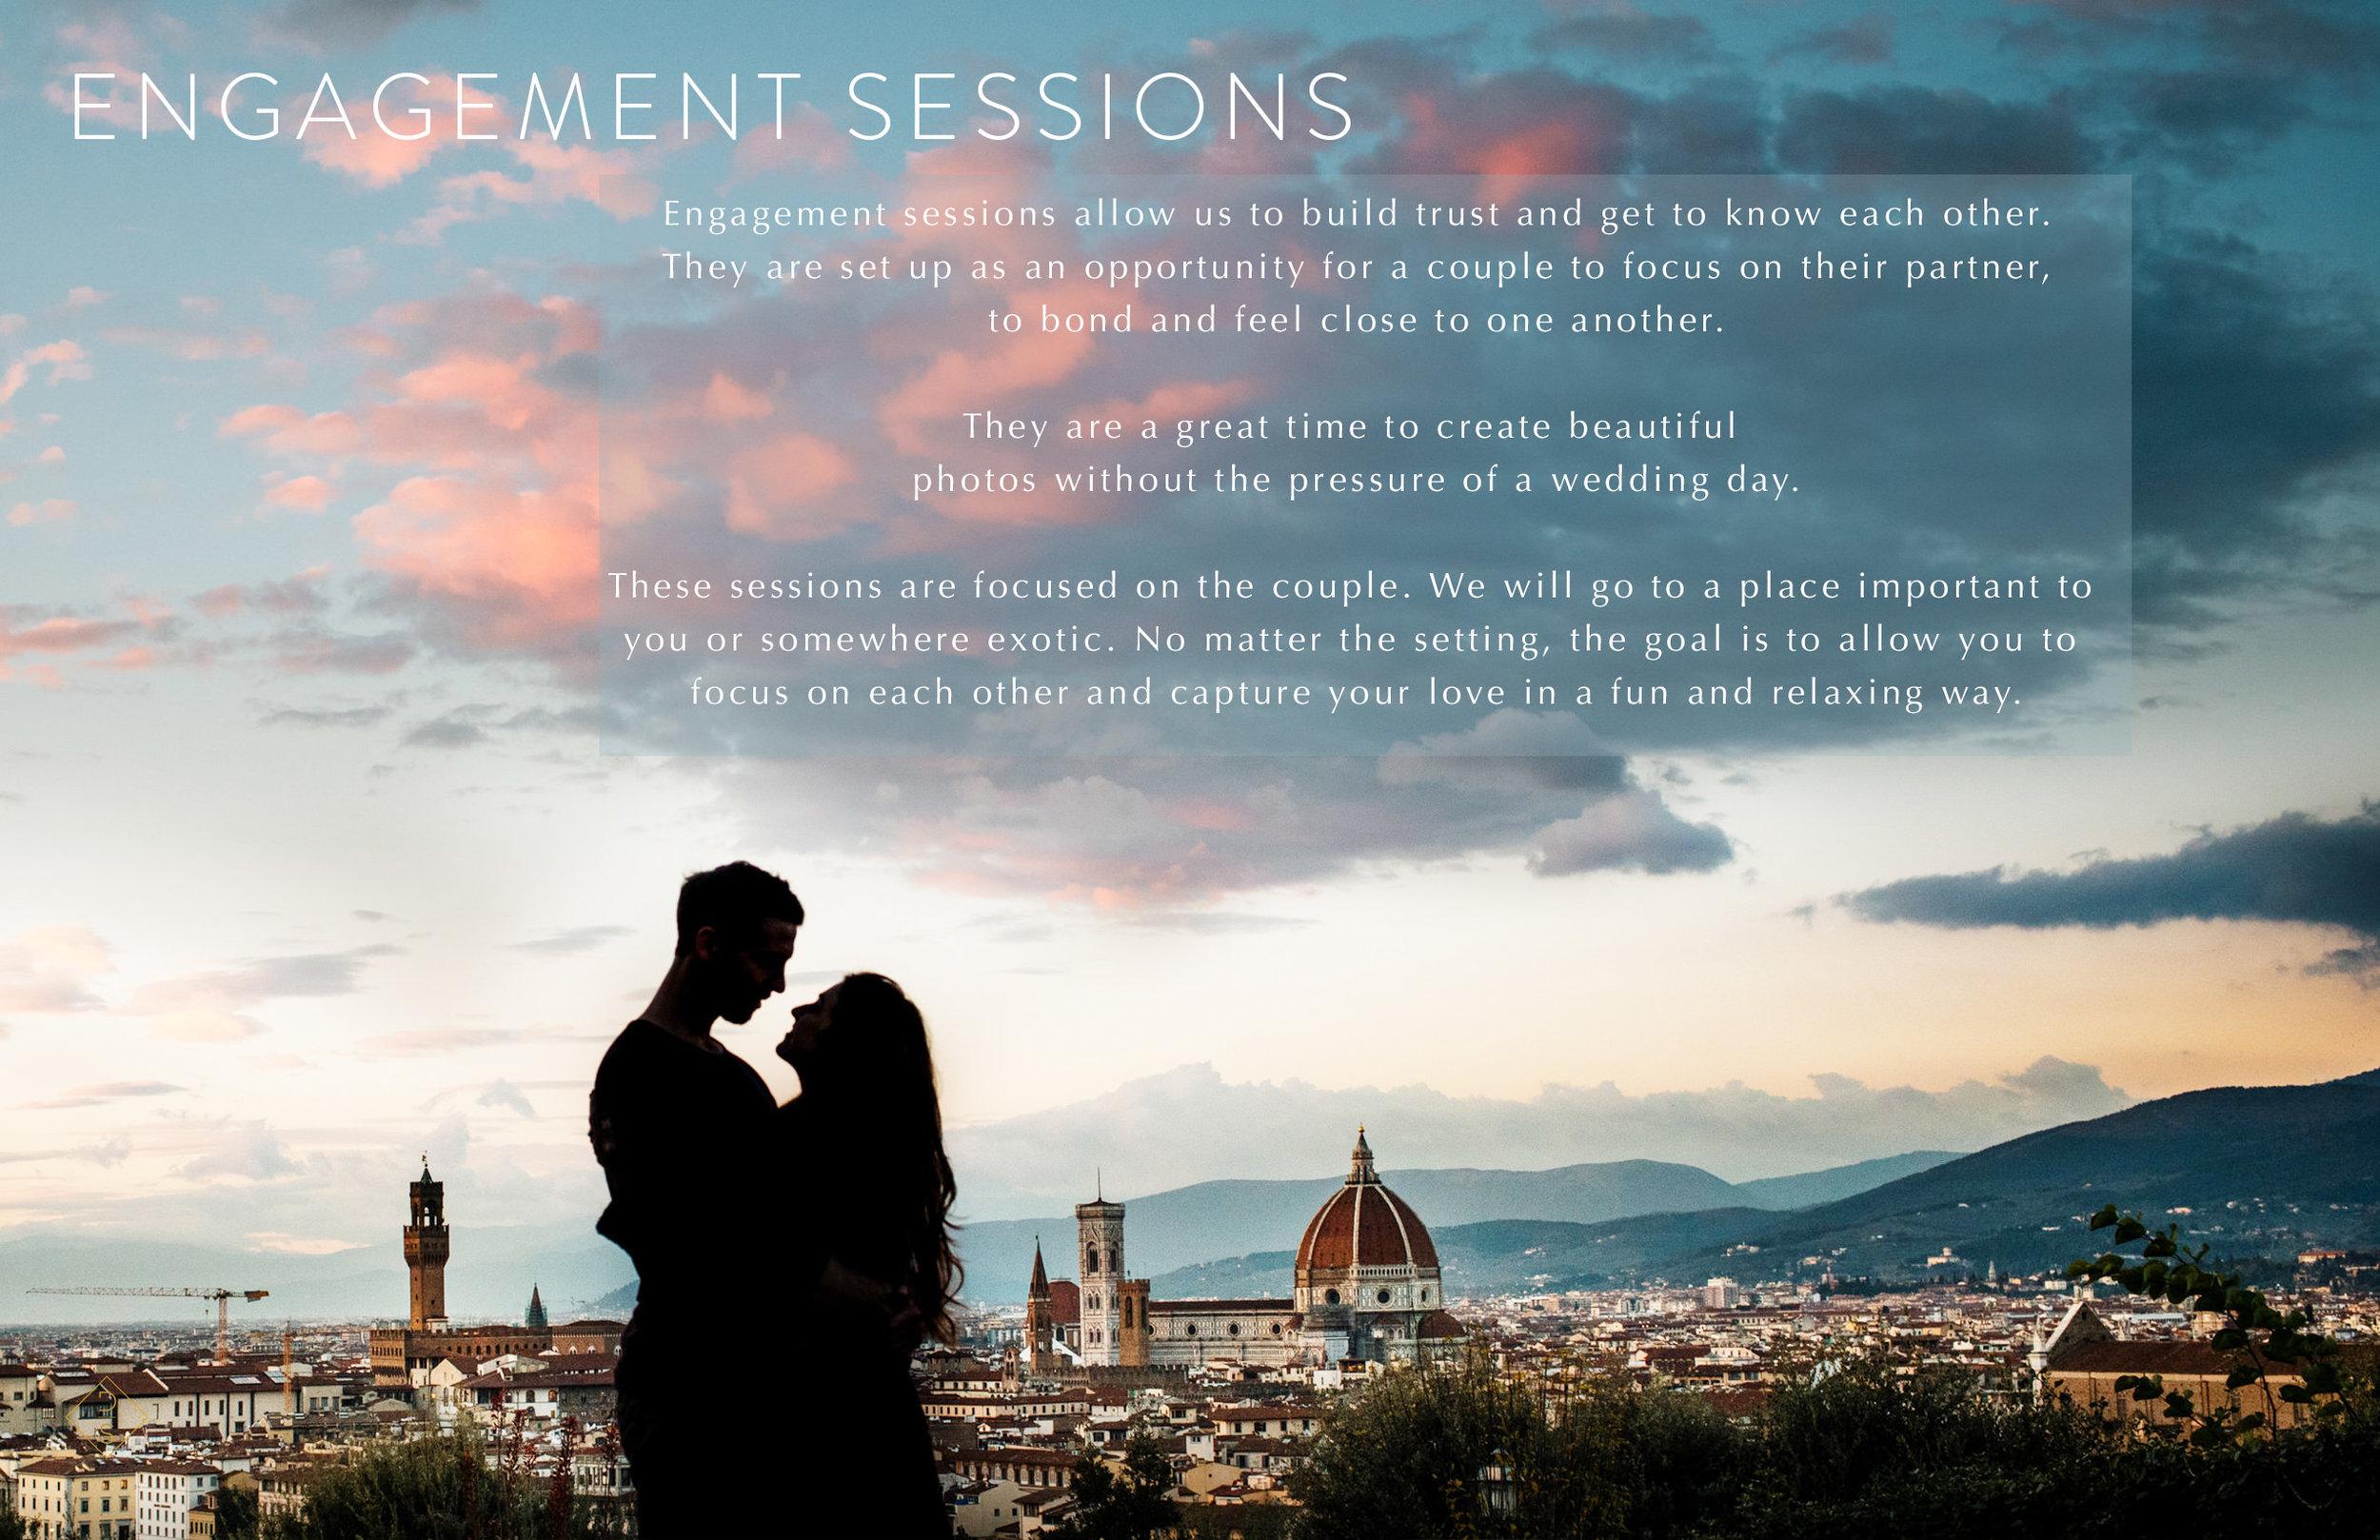 16-Engagement session.jpg